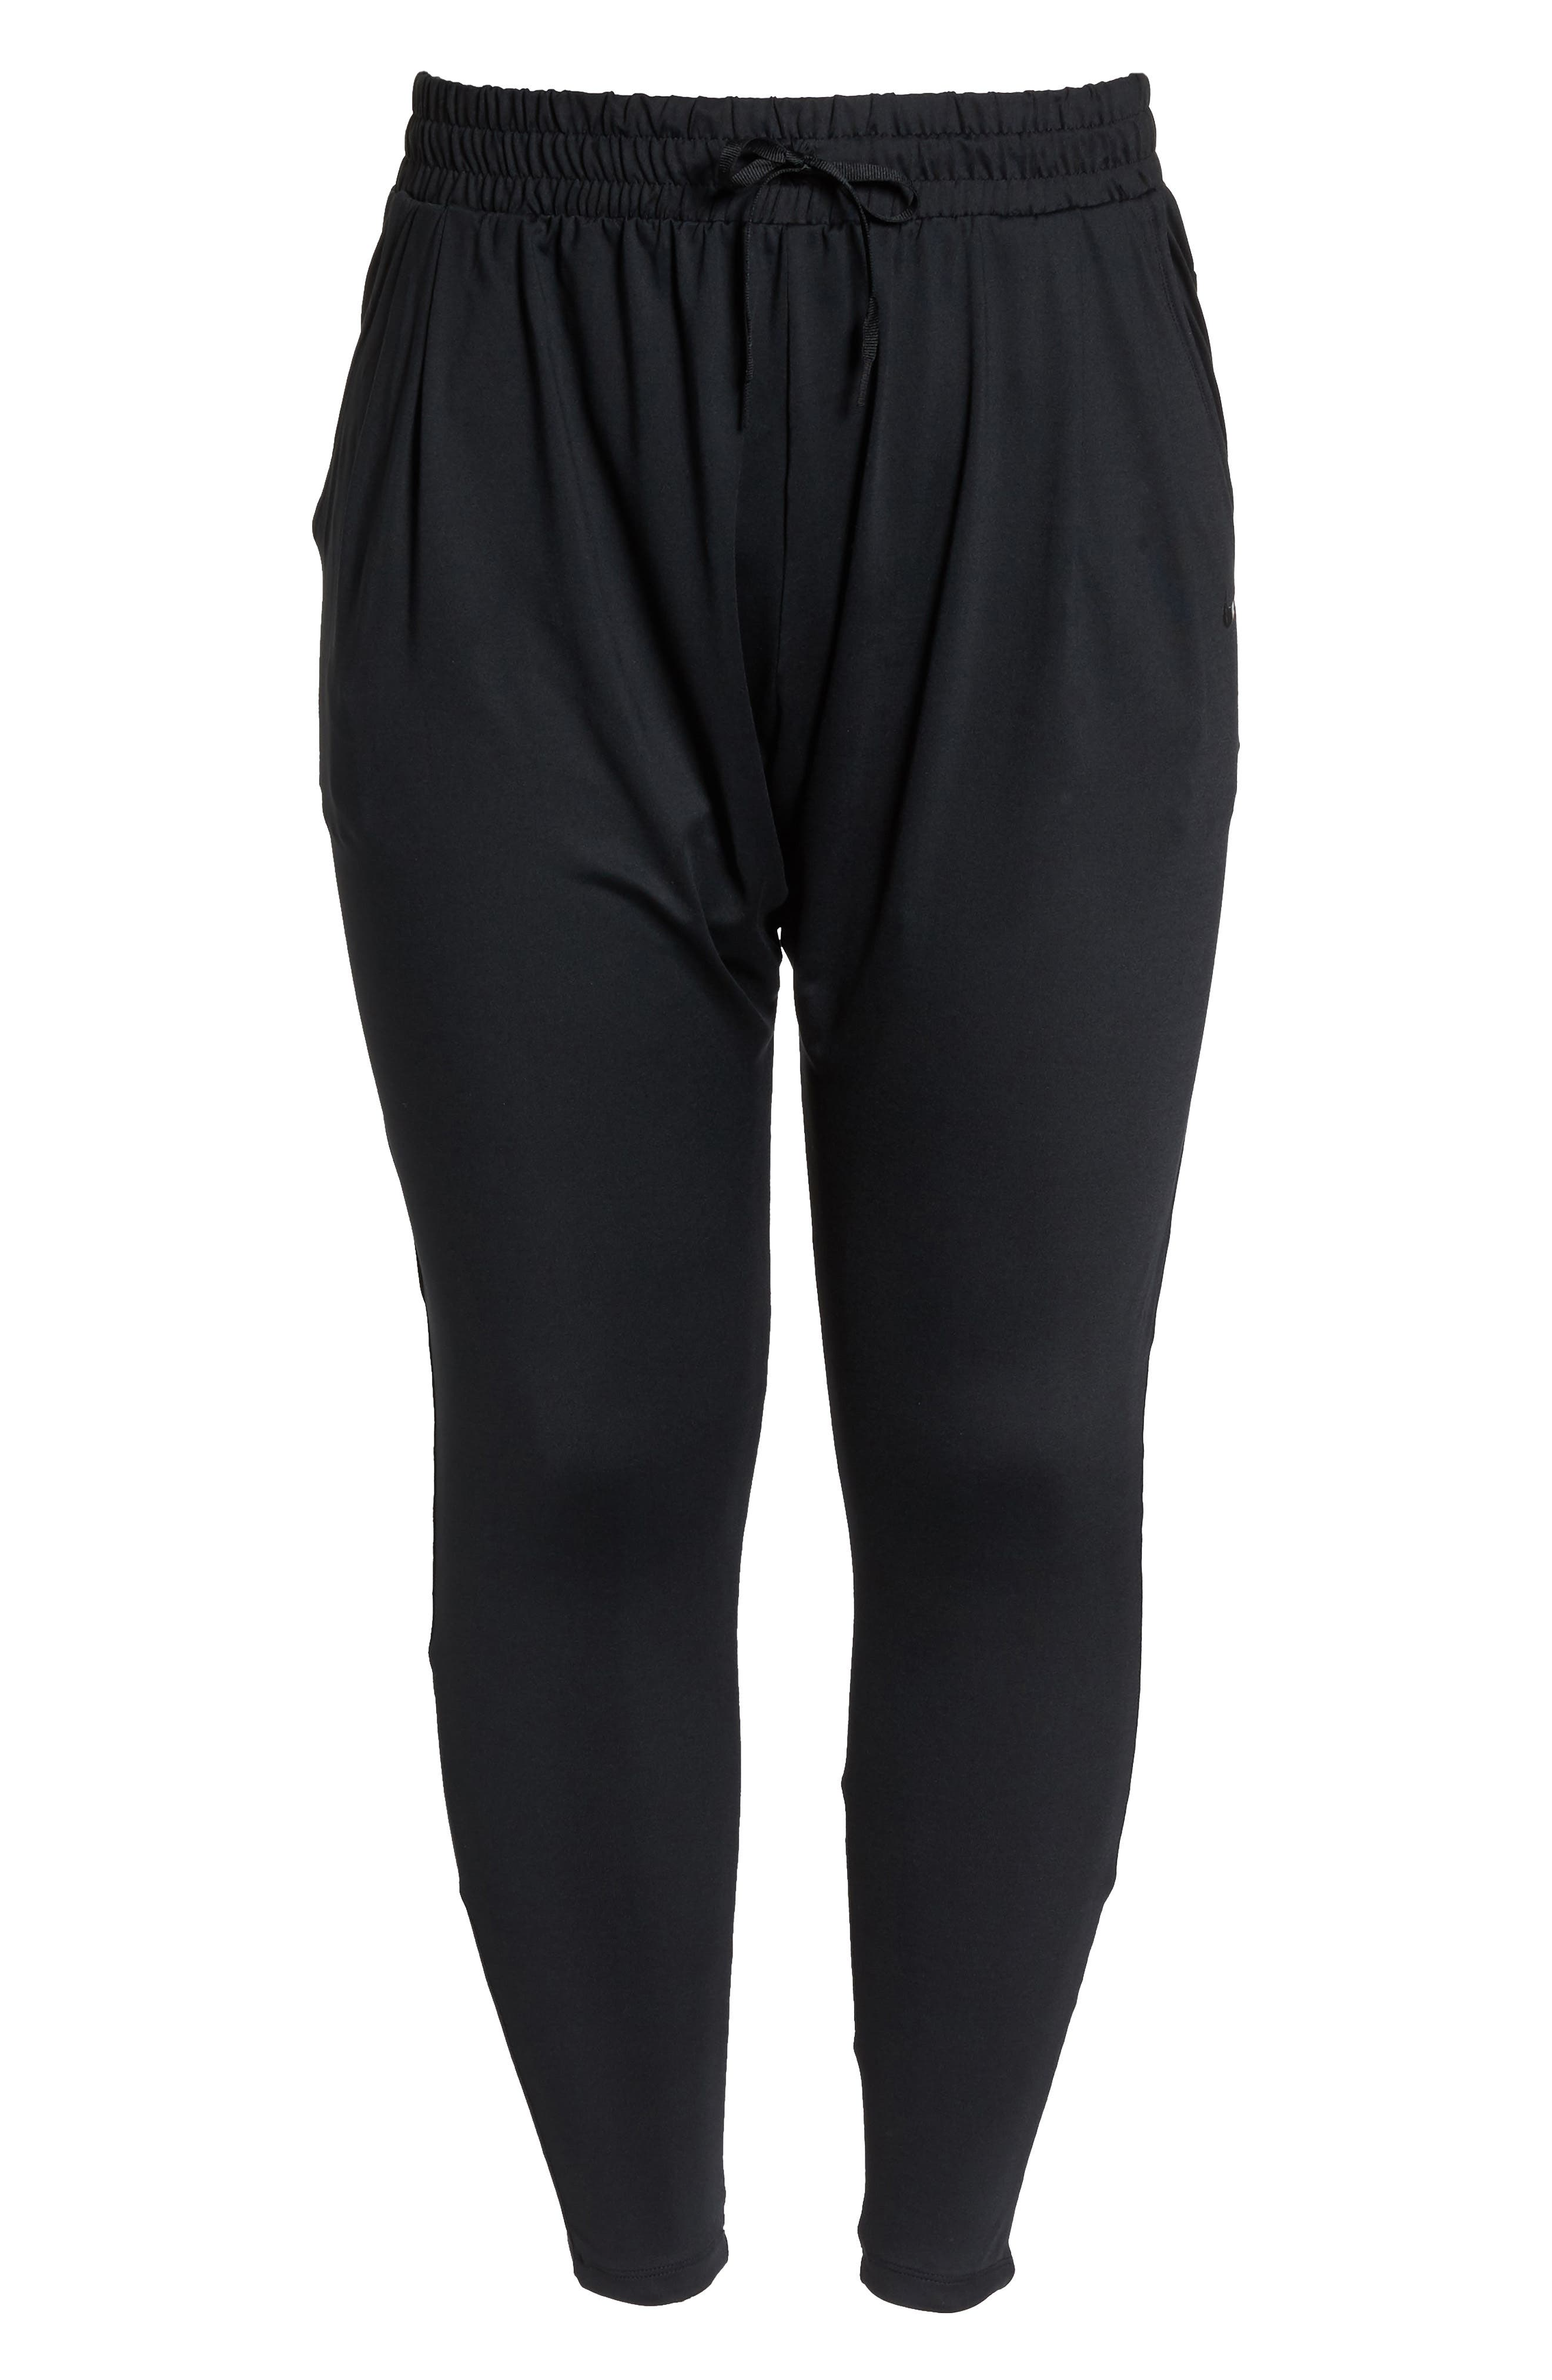 Dry Lux Flow Training Pants,                             Alternate thumbnail 6, color,                             Black/ Clear